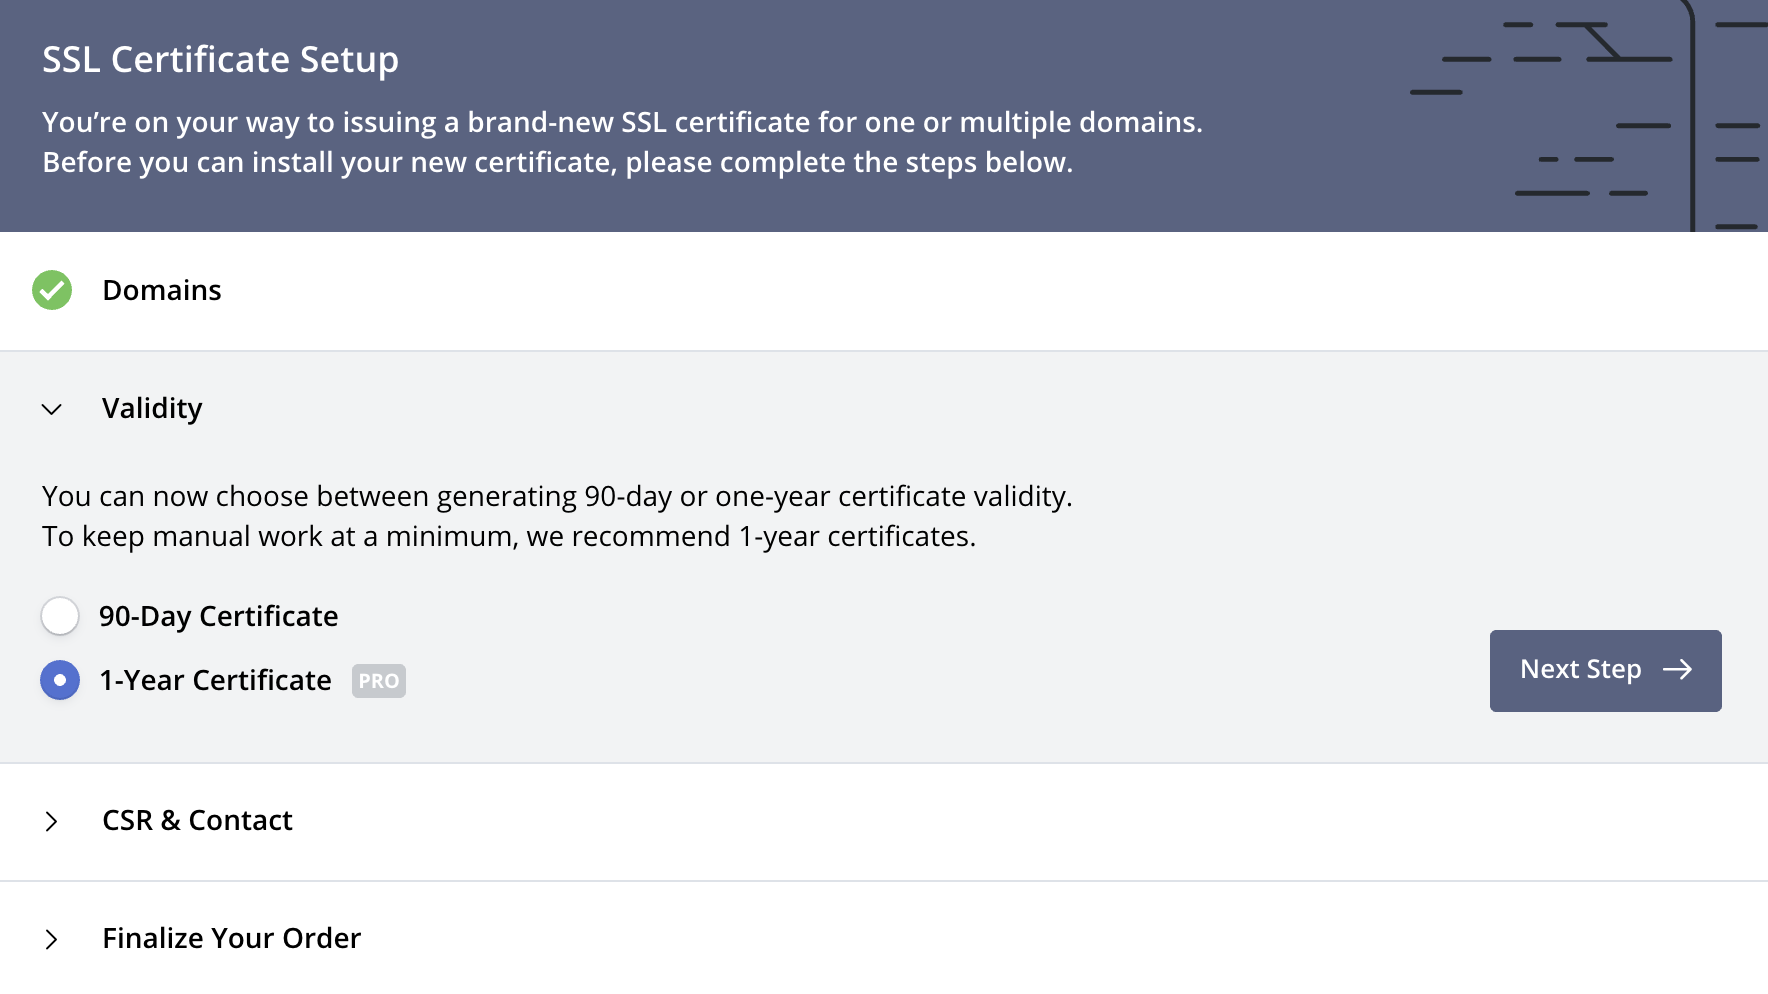 Create Certificate: Validity